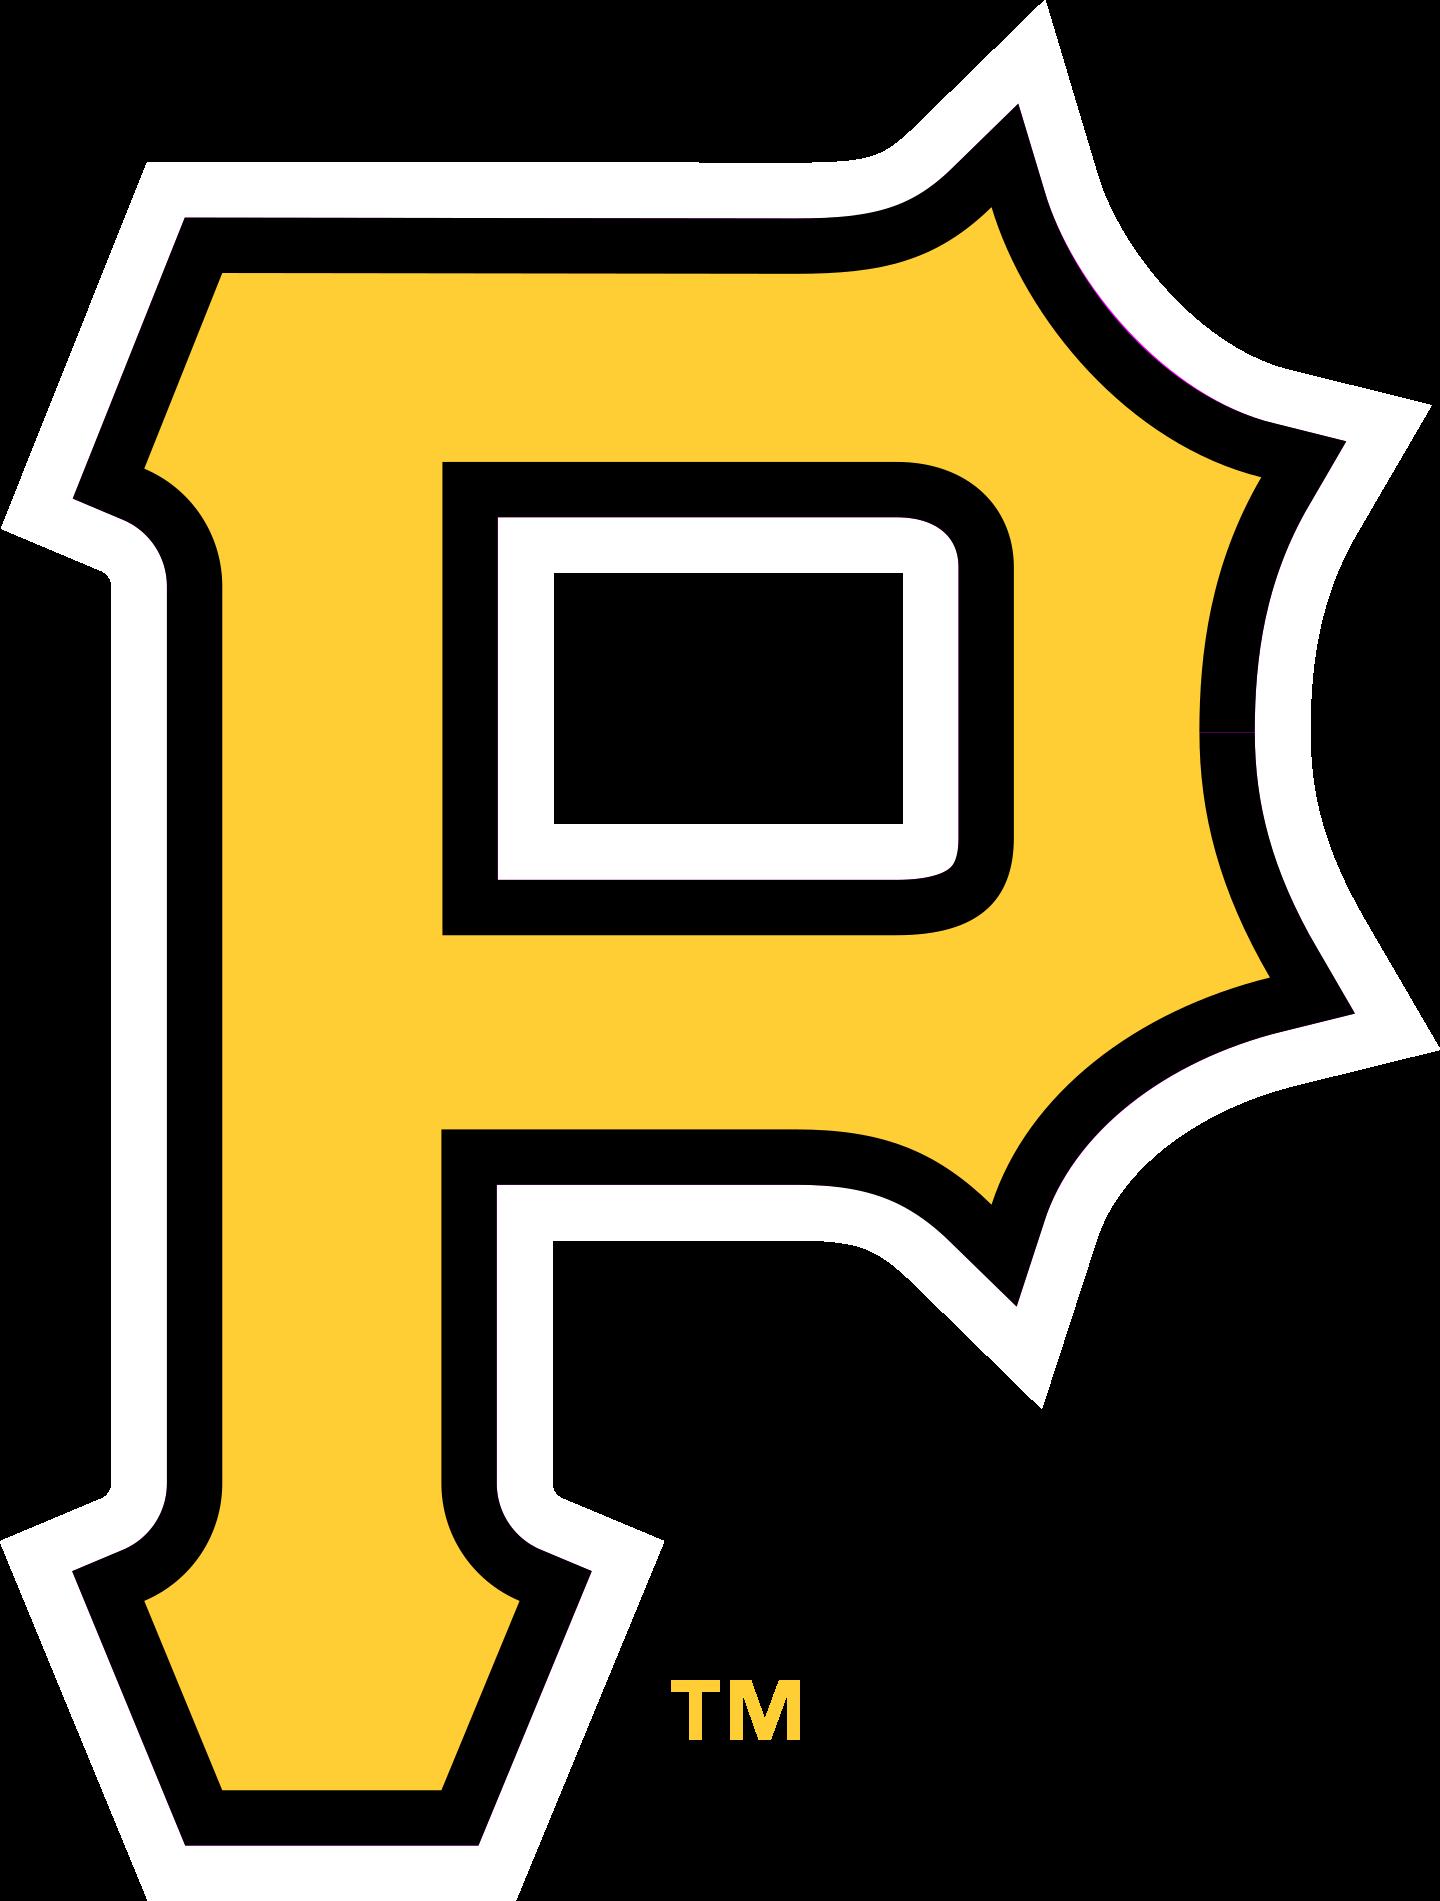 pittsburgh pirates logo 2 - Pittsburgh Pirates Logo